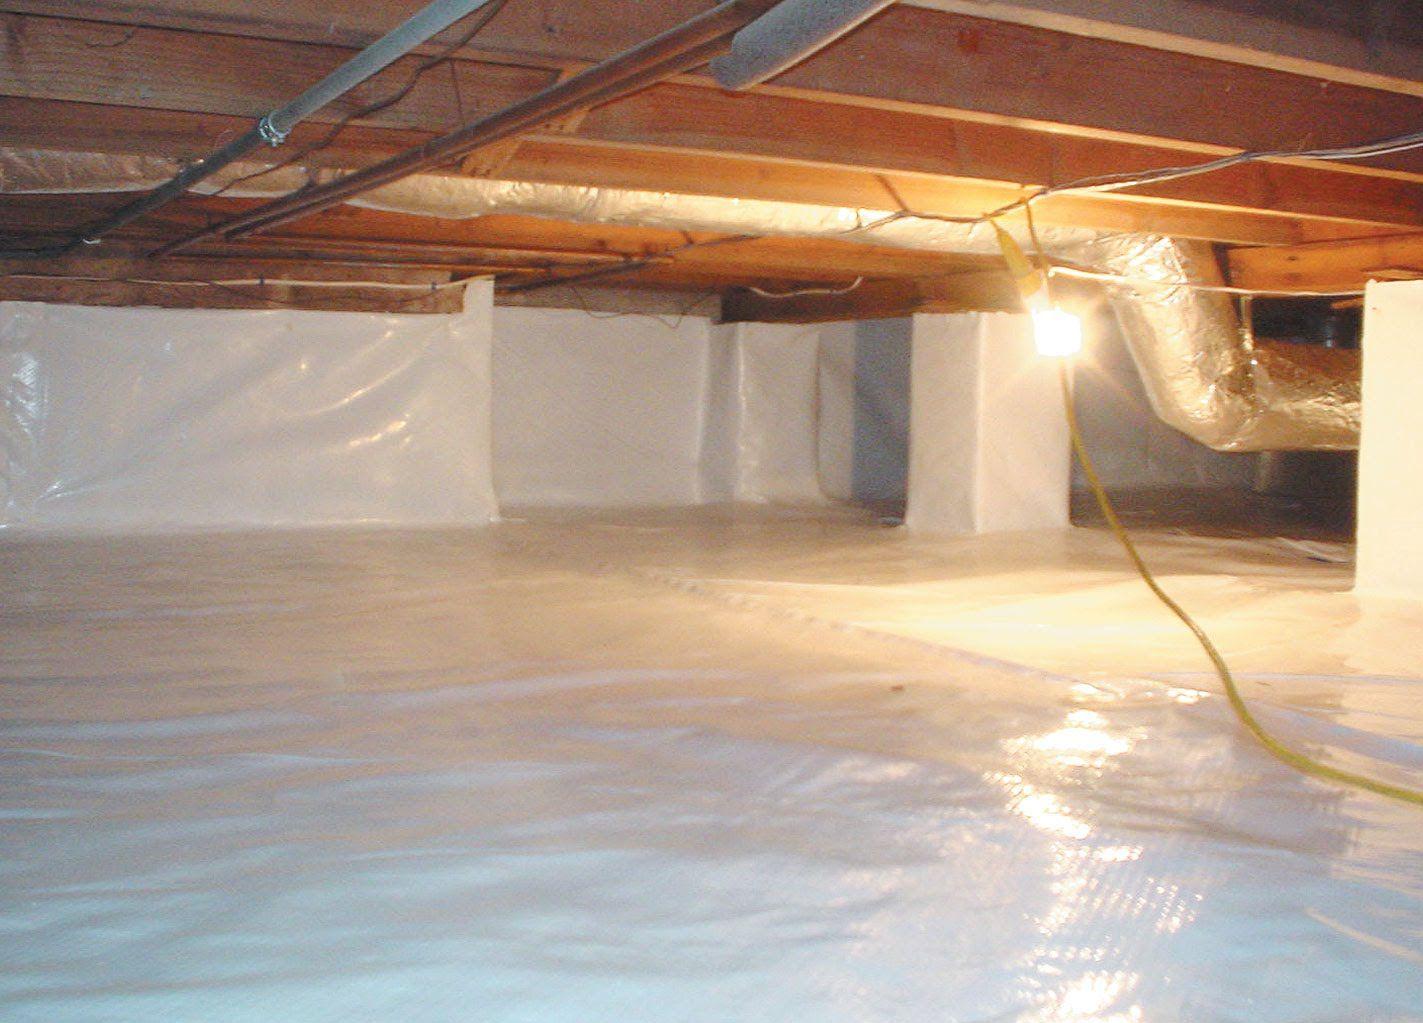 Crawl Space Waterproofing Encapsulation Jpg Remodeling Mobile Homes Crawlspace Crawl Space Encapsulation